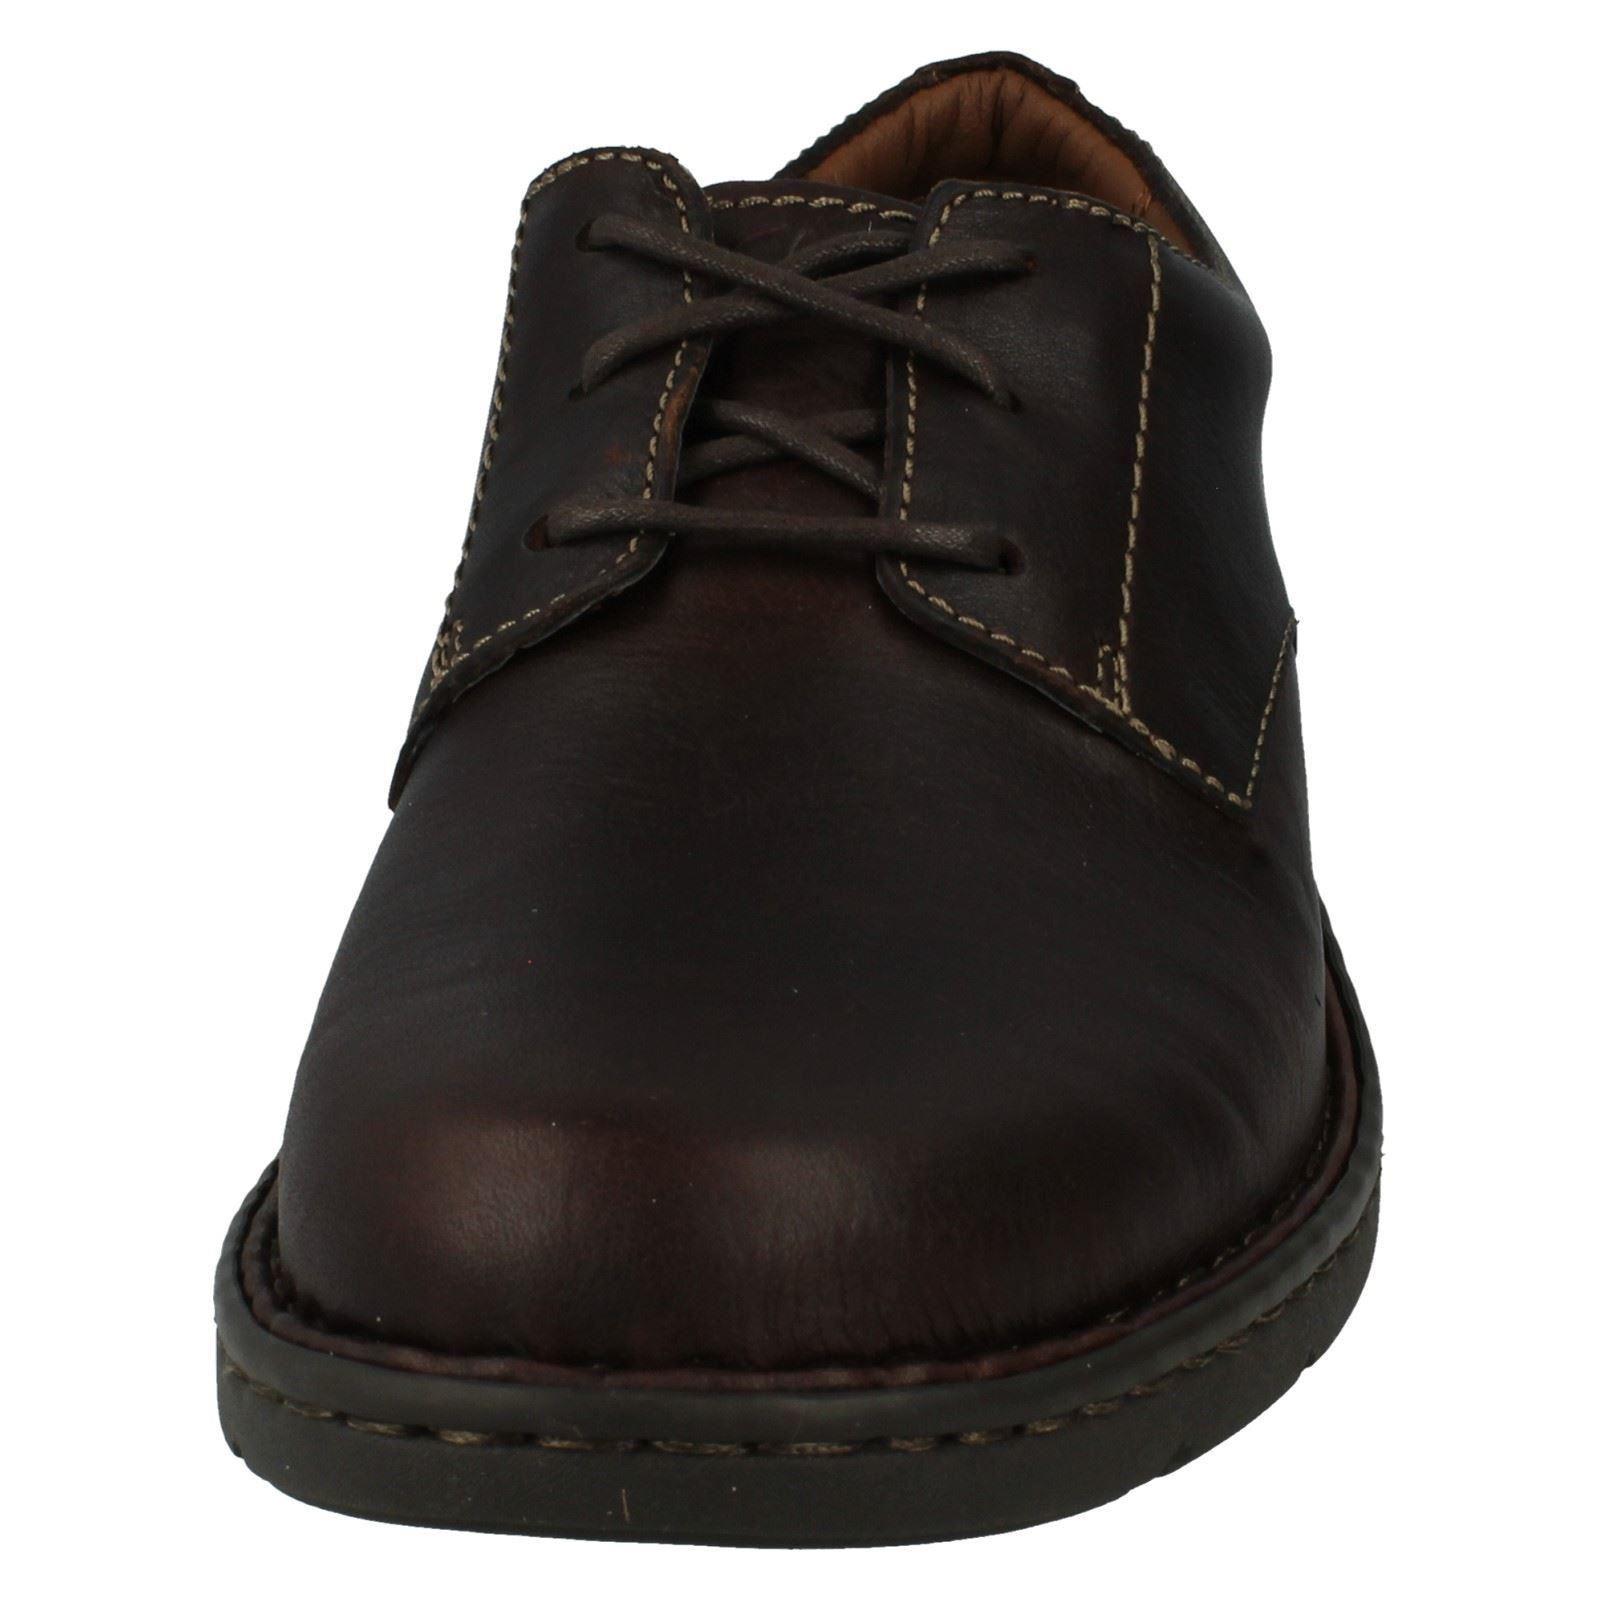 Para Clarks Hombre Clarks Para Zapatos Casuales Etiqueta Stratton forma 946da5